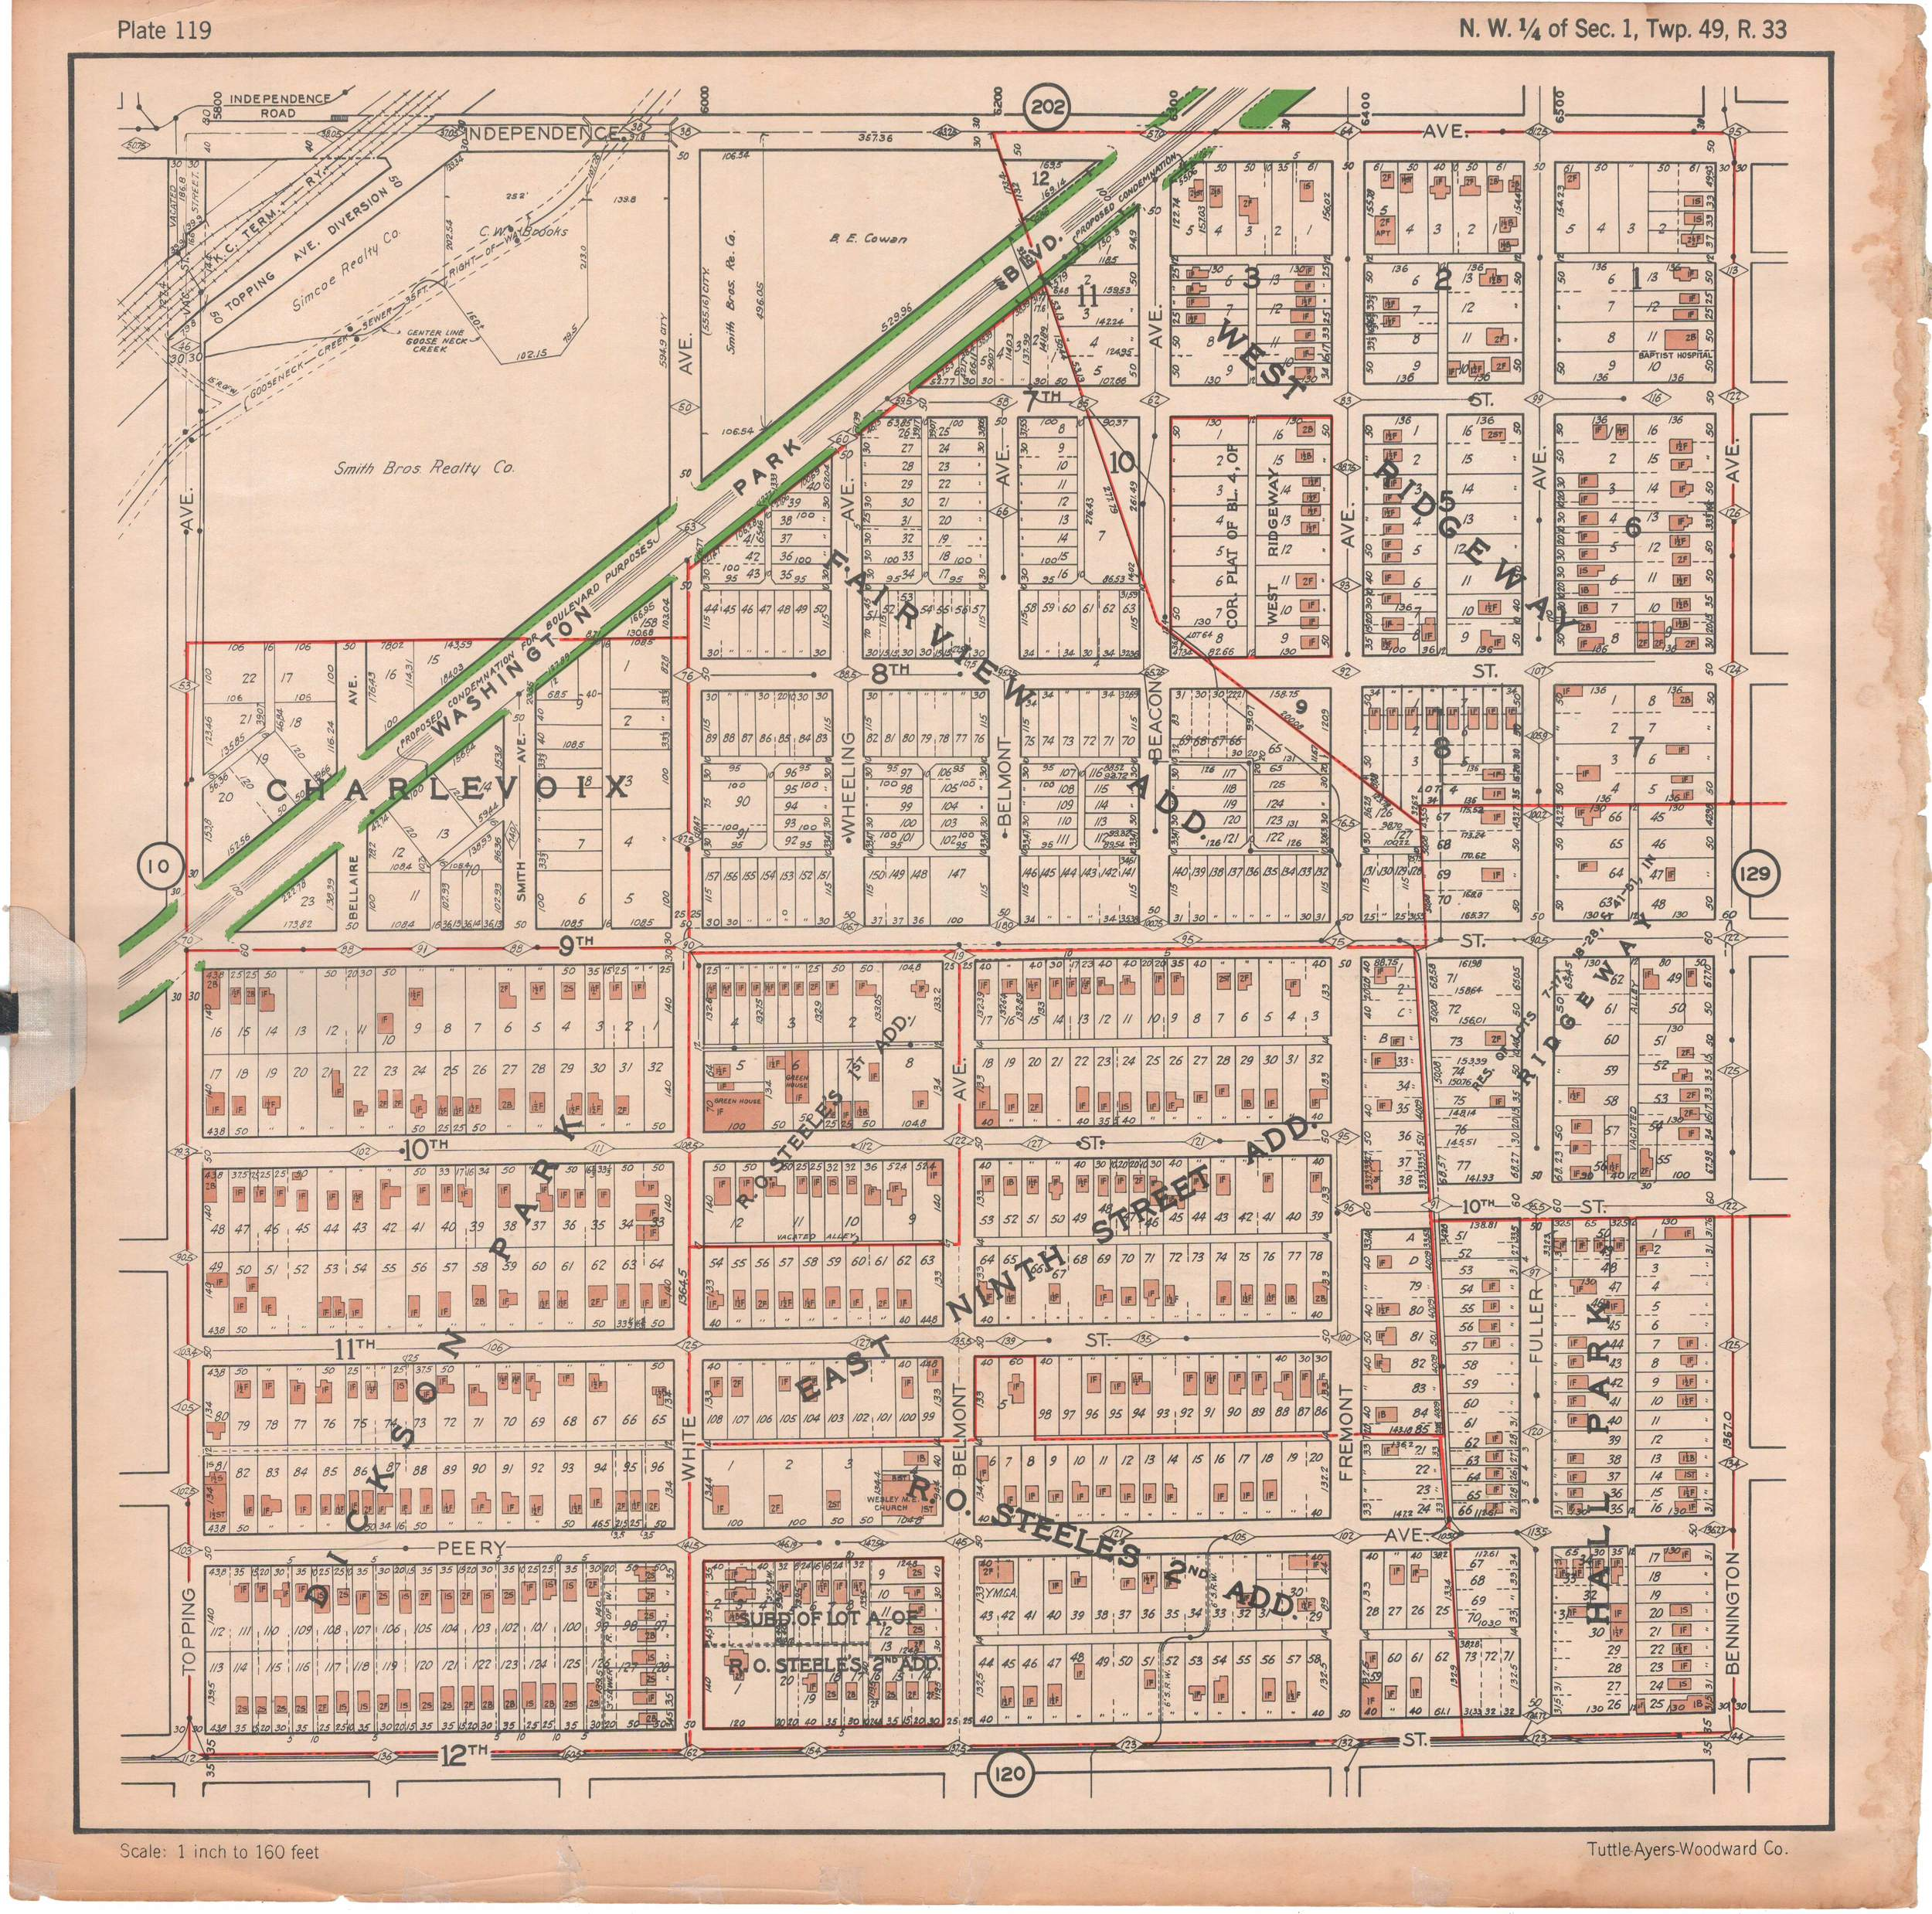 1925 TUTTLE_AYERS_Plate 119.JPG